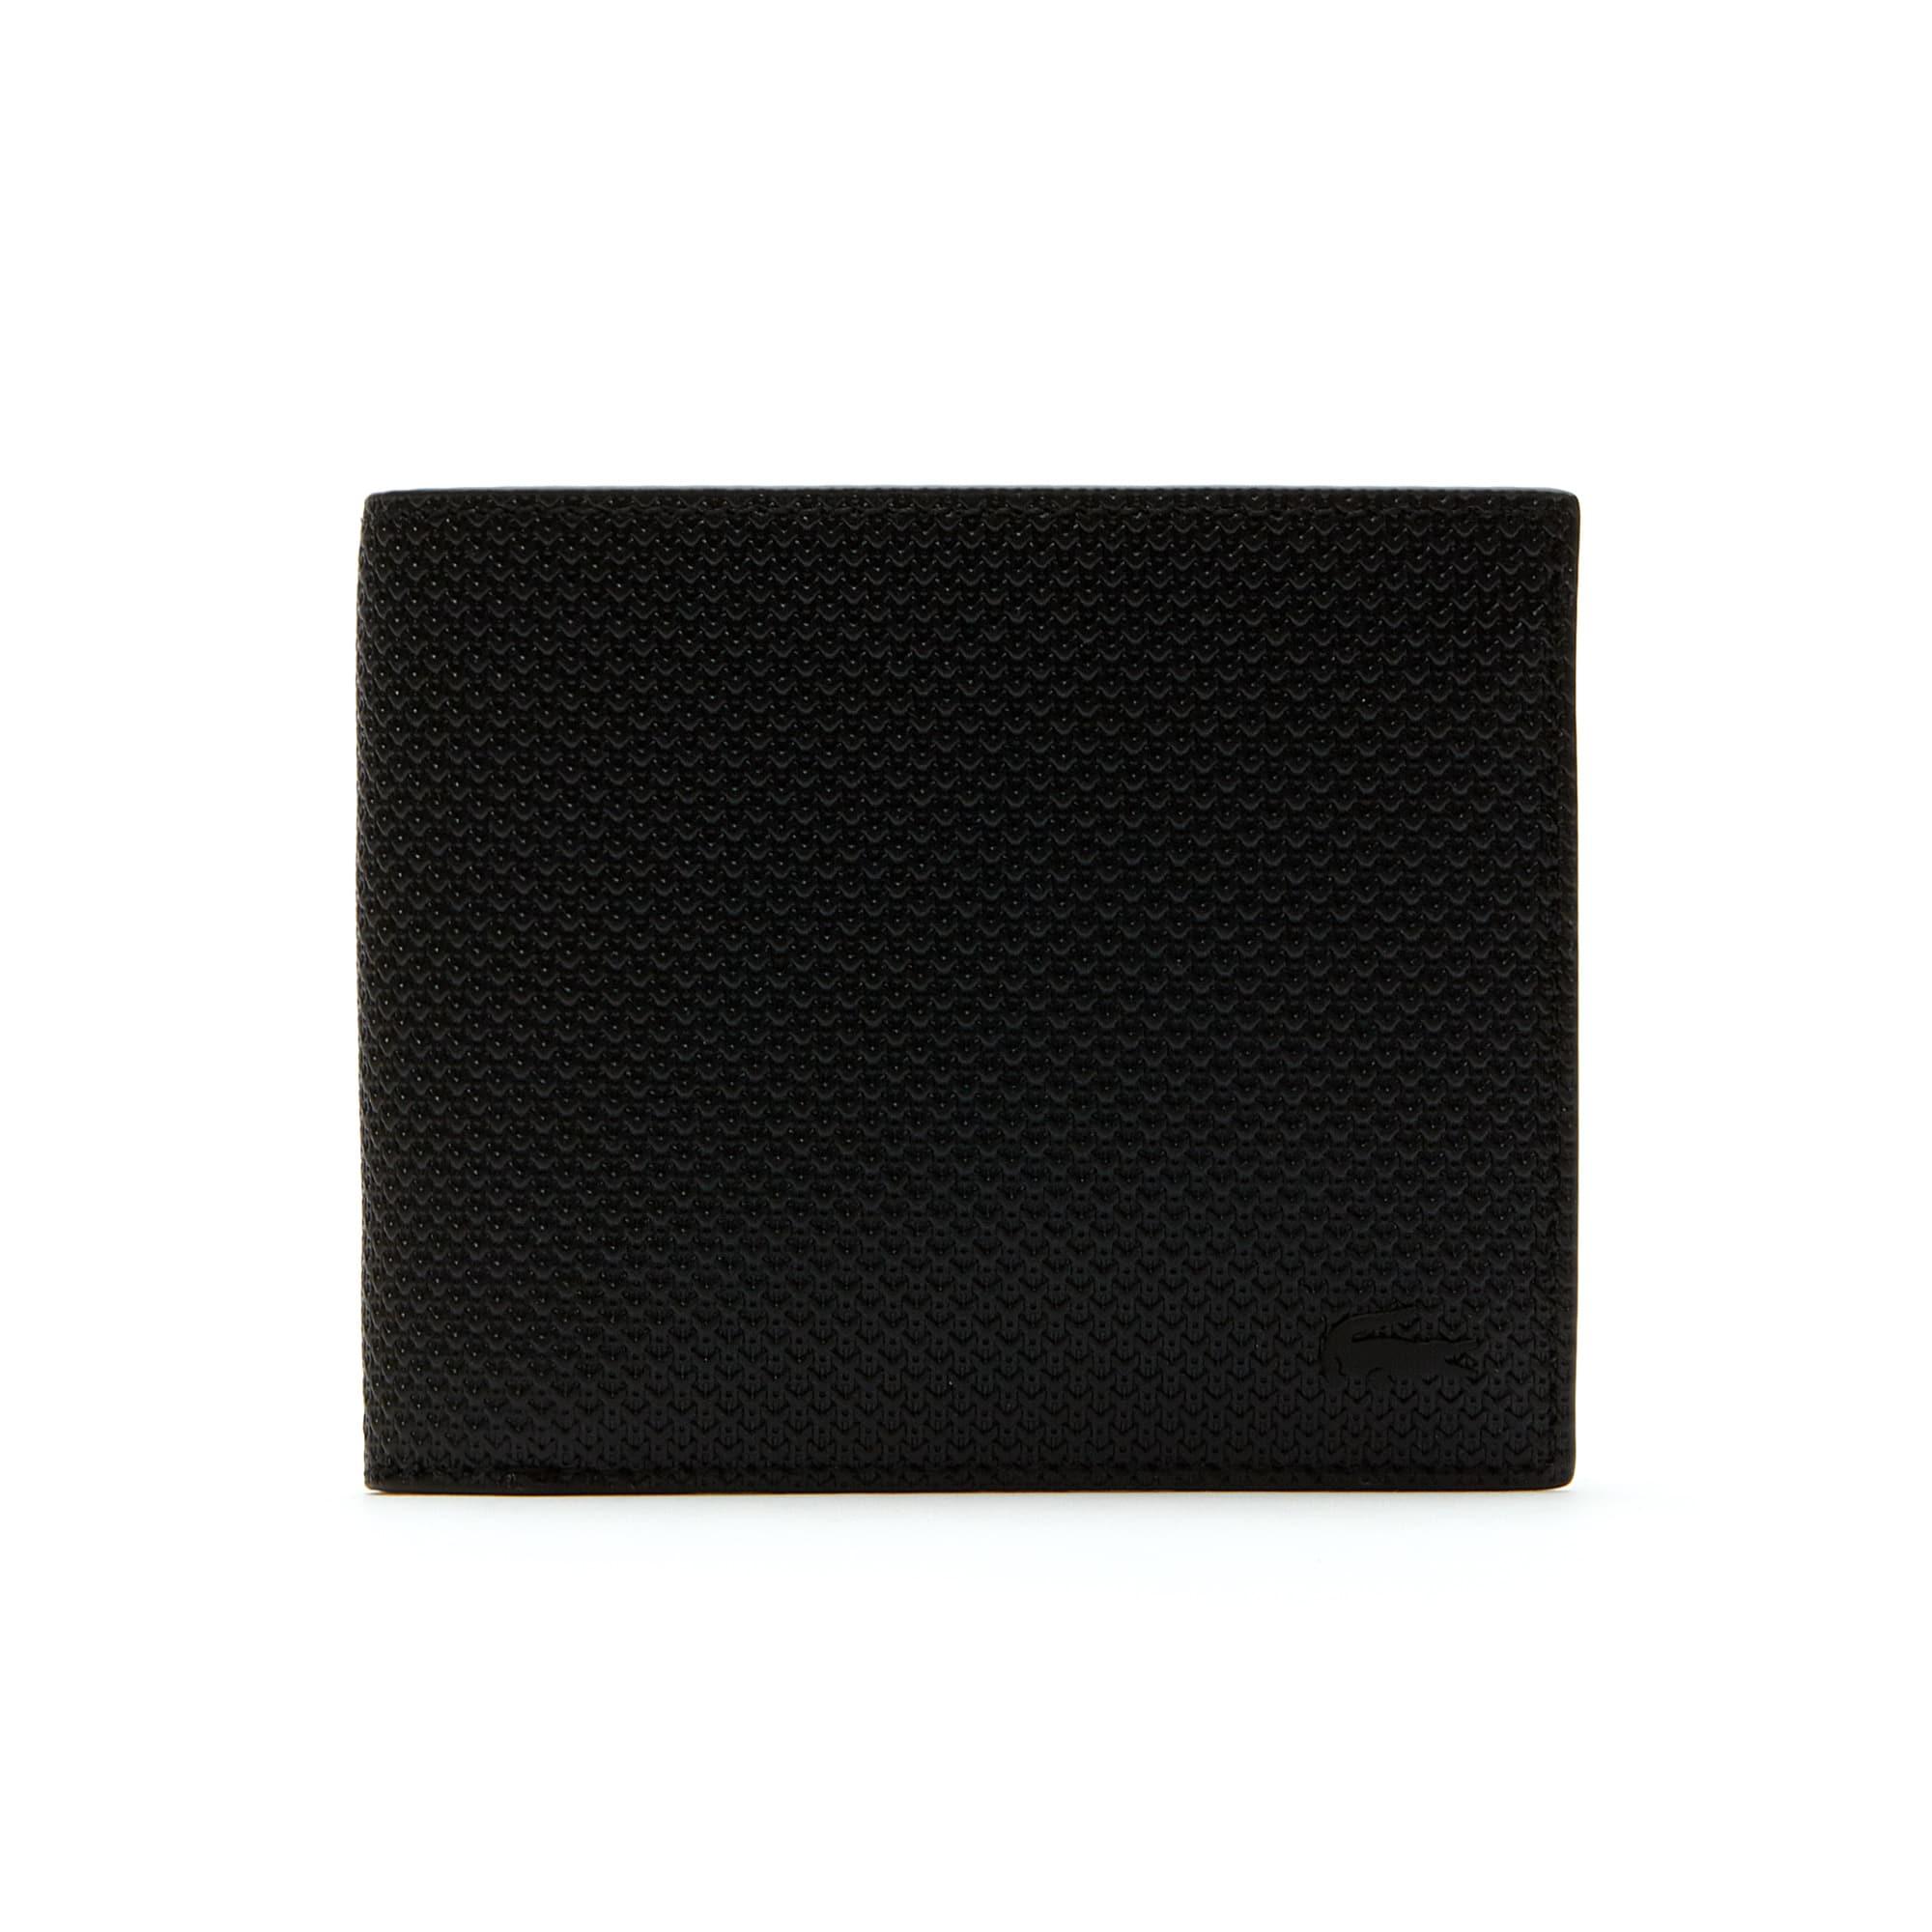 Men's Chantaco Matte Piqué Leather Three Card Wallet